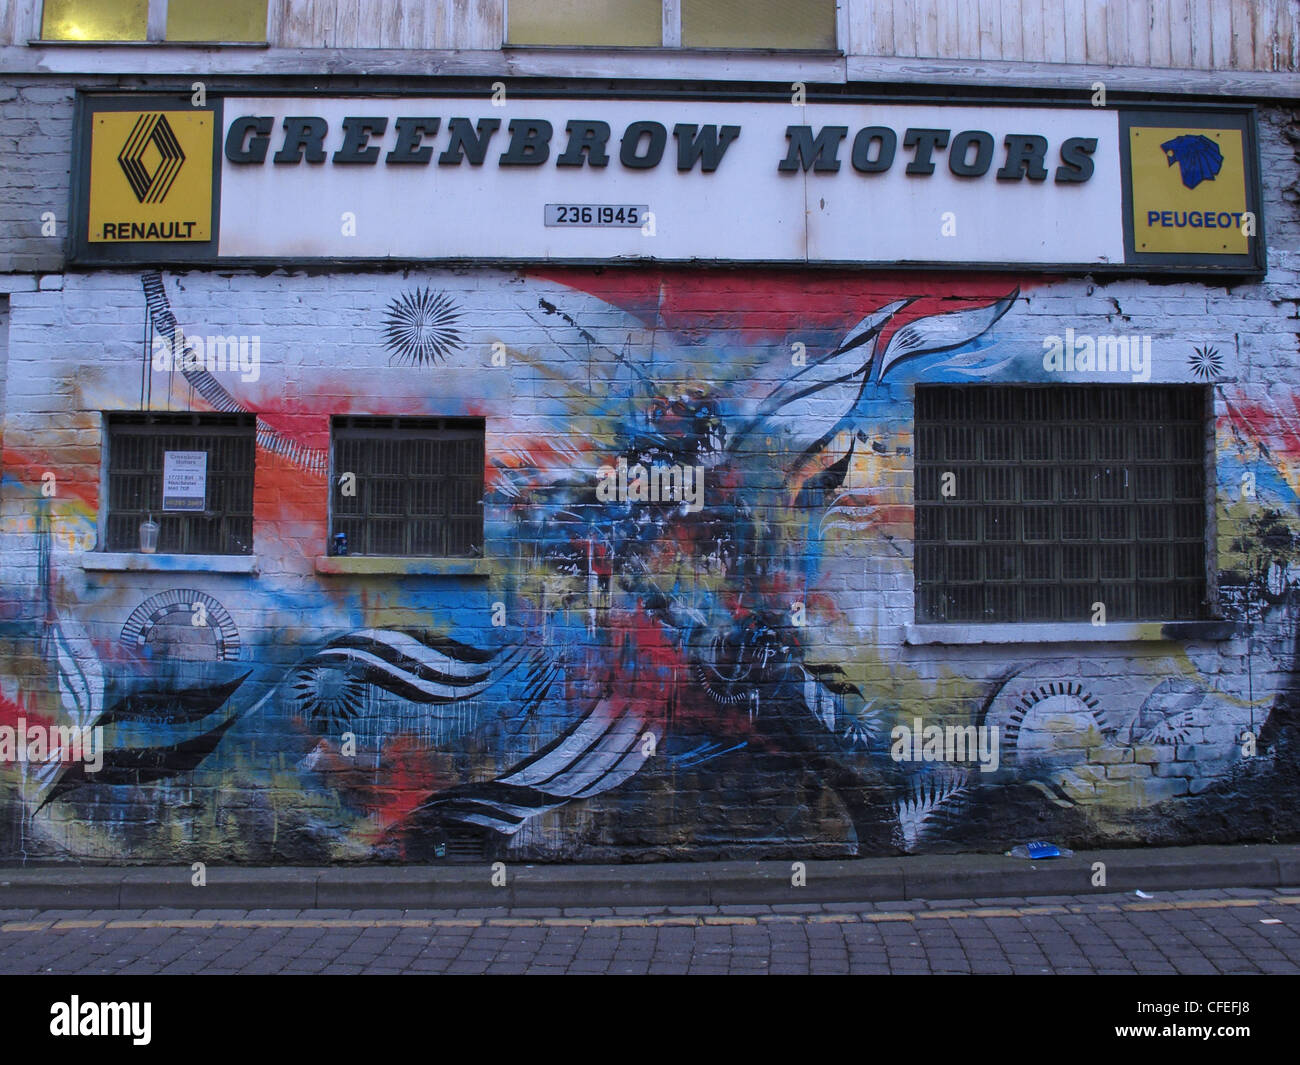 Inner city Manchester graffiti at Greenbow Motors 51 New Wakefield St - Stock Image